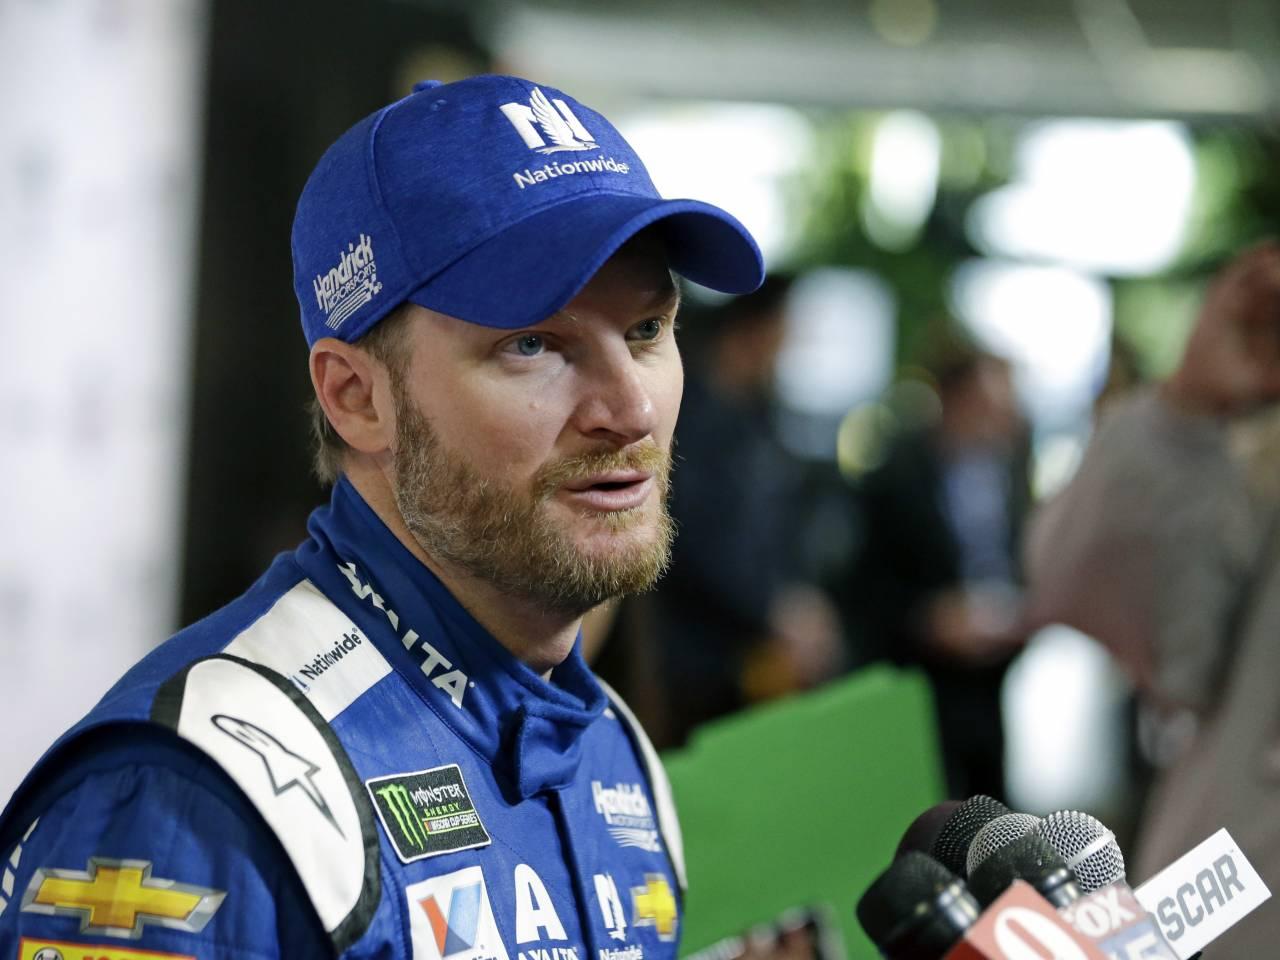 Michael Waltrip driving emotional last race at Daytona